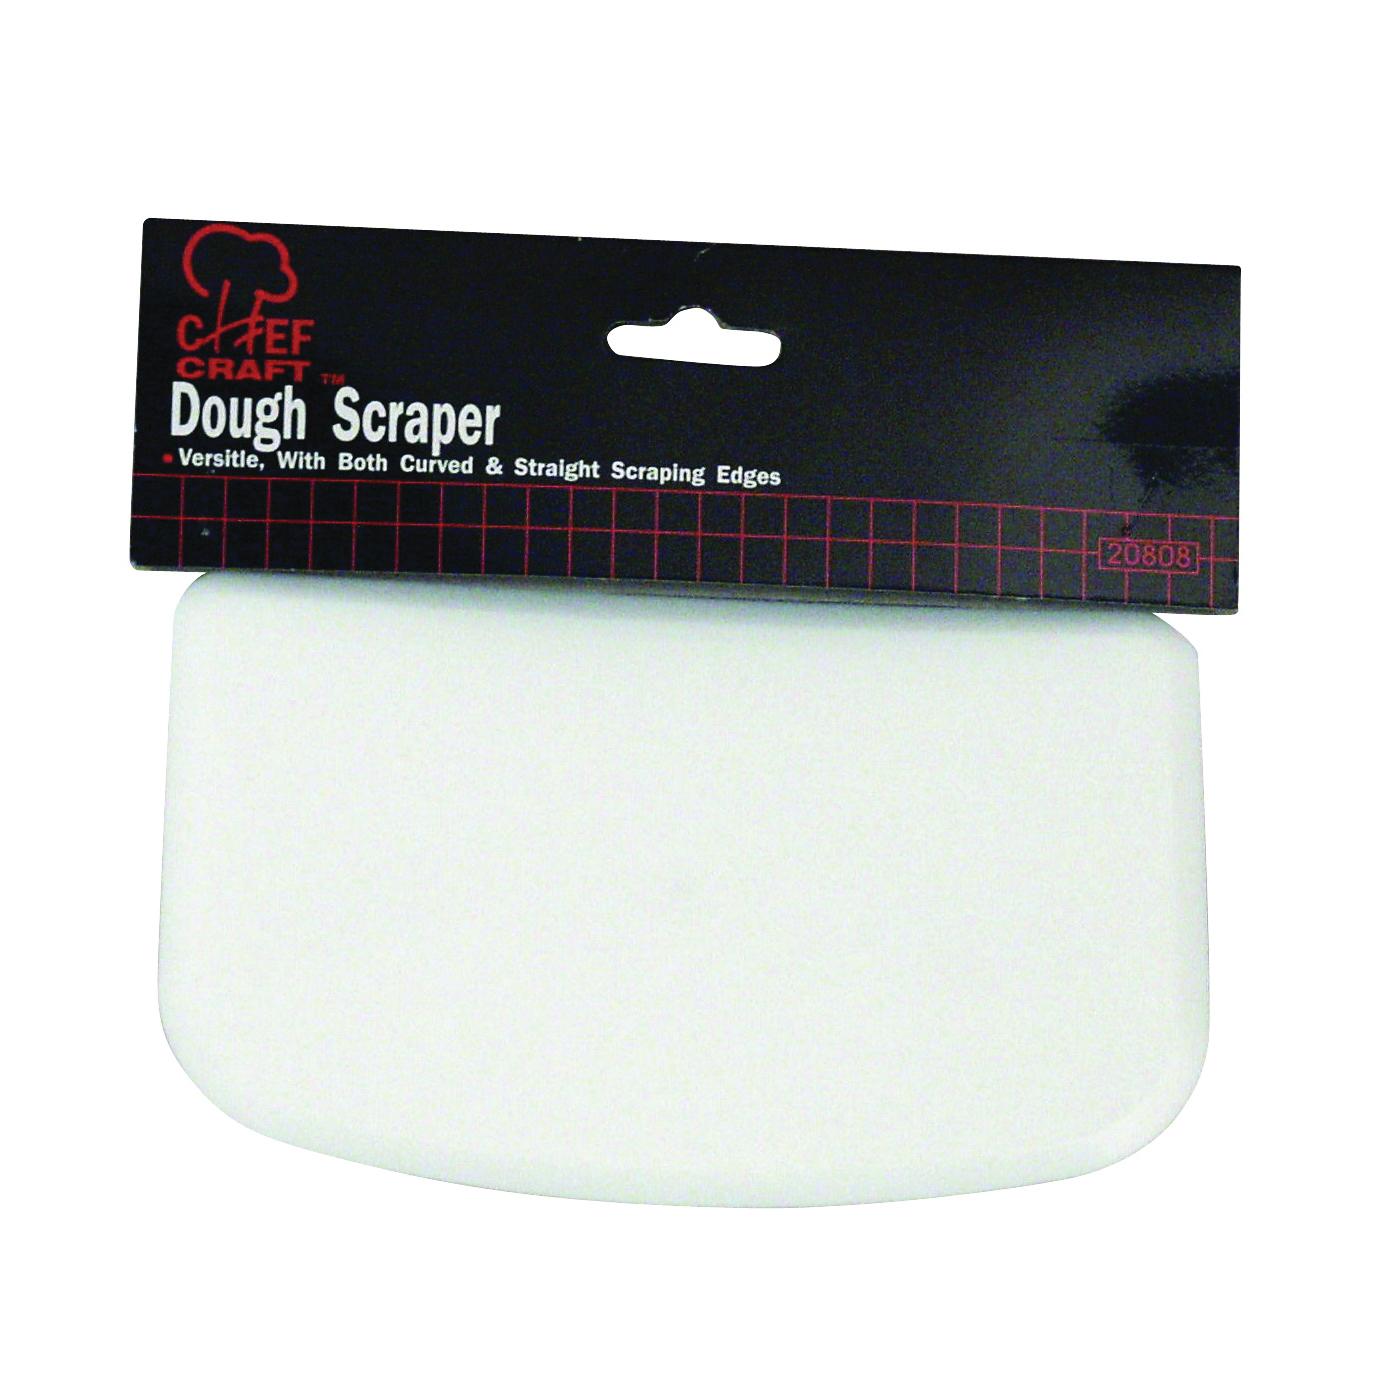 Picture of CHEF CRAFT 20808 Dough Scraper, 6 in L, 4 in W, Plastic, White